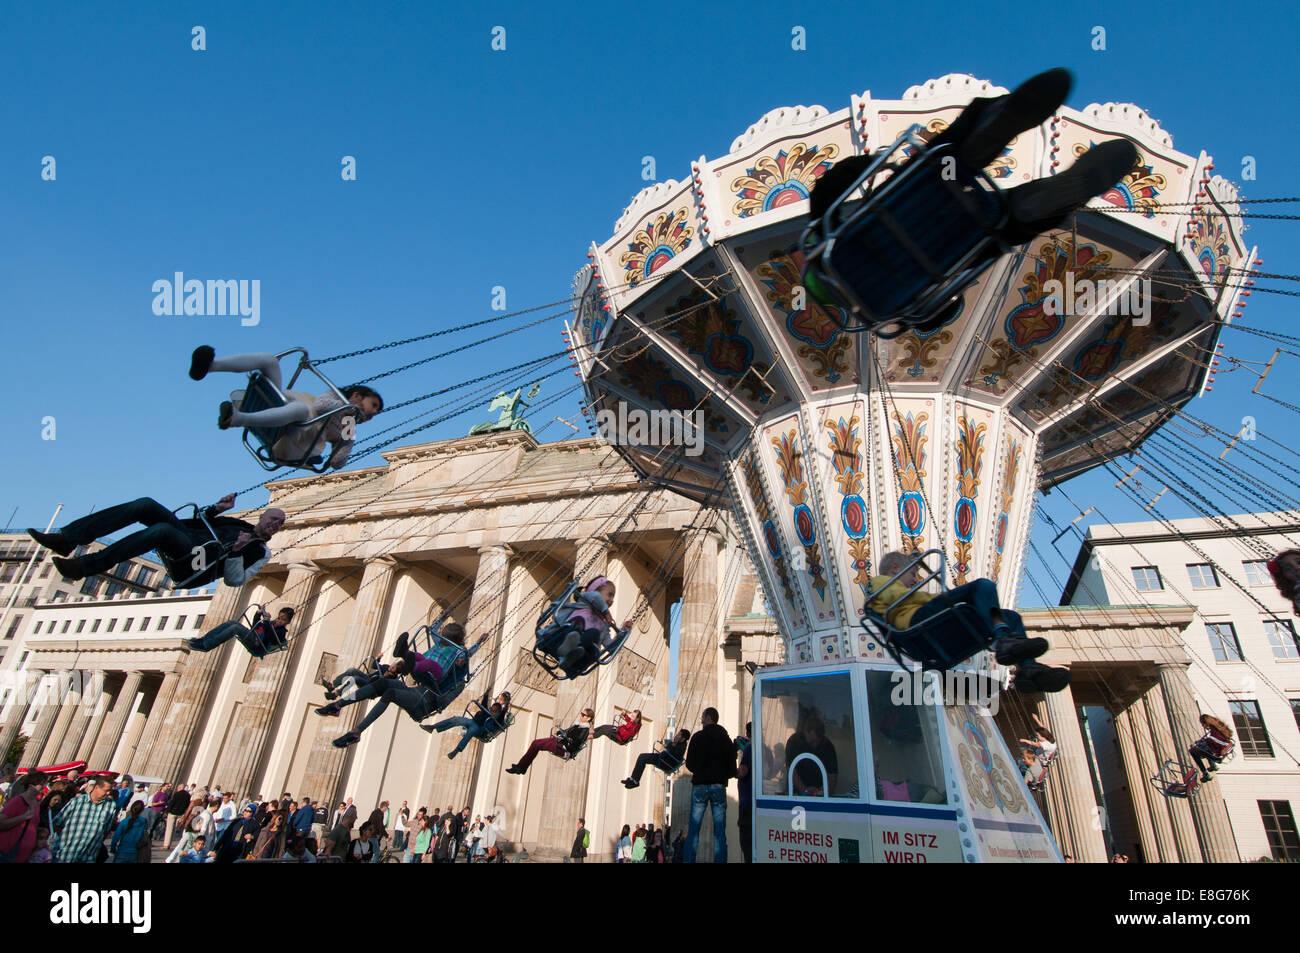 Carousel at Brandenburg Gate during street festival marking German Unity Day holiday - Stock Image